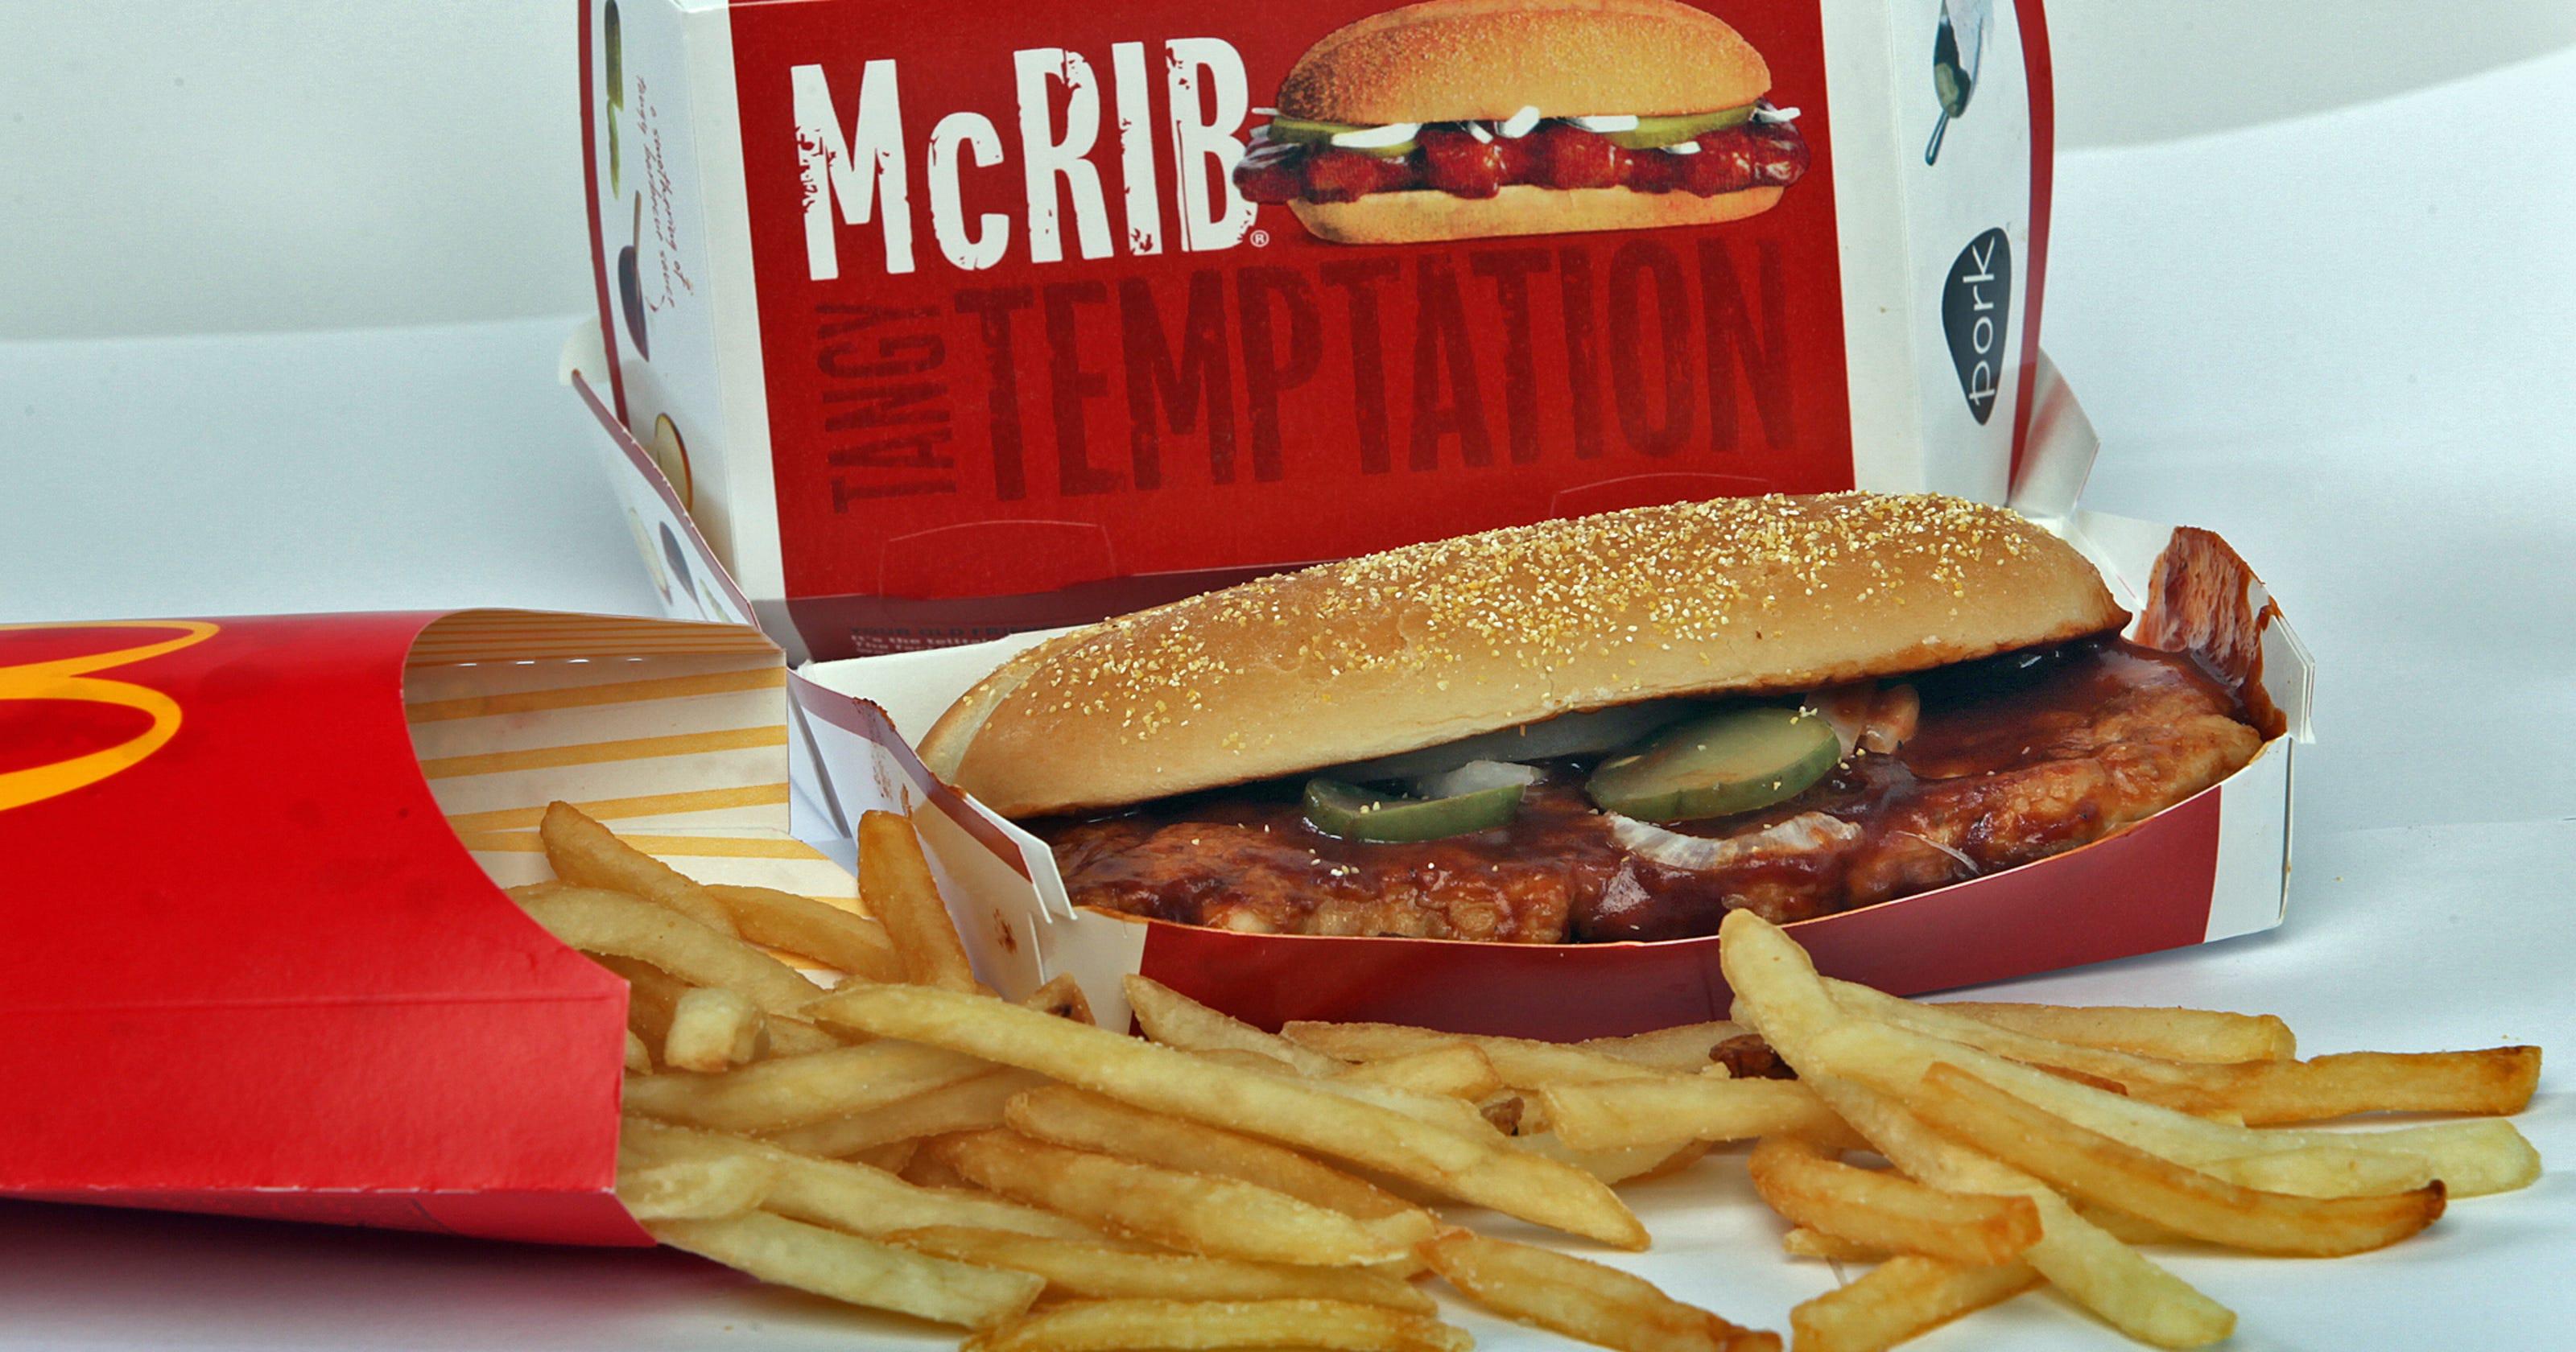 mcdonalds mc mcrib mcdonalds - HD3200×1680